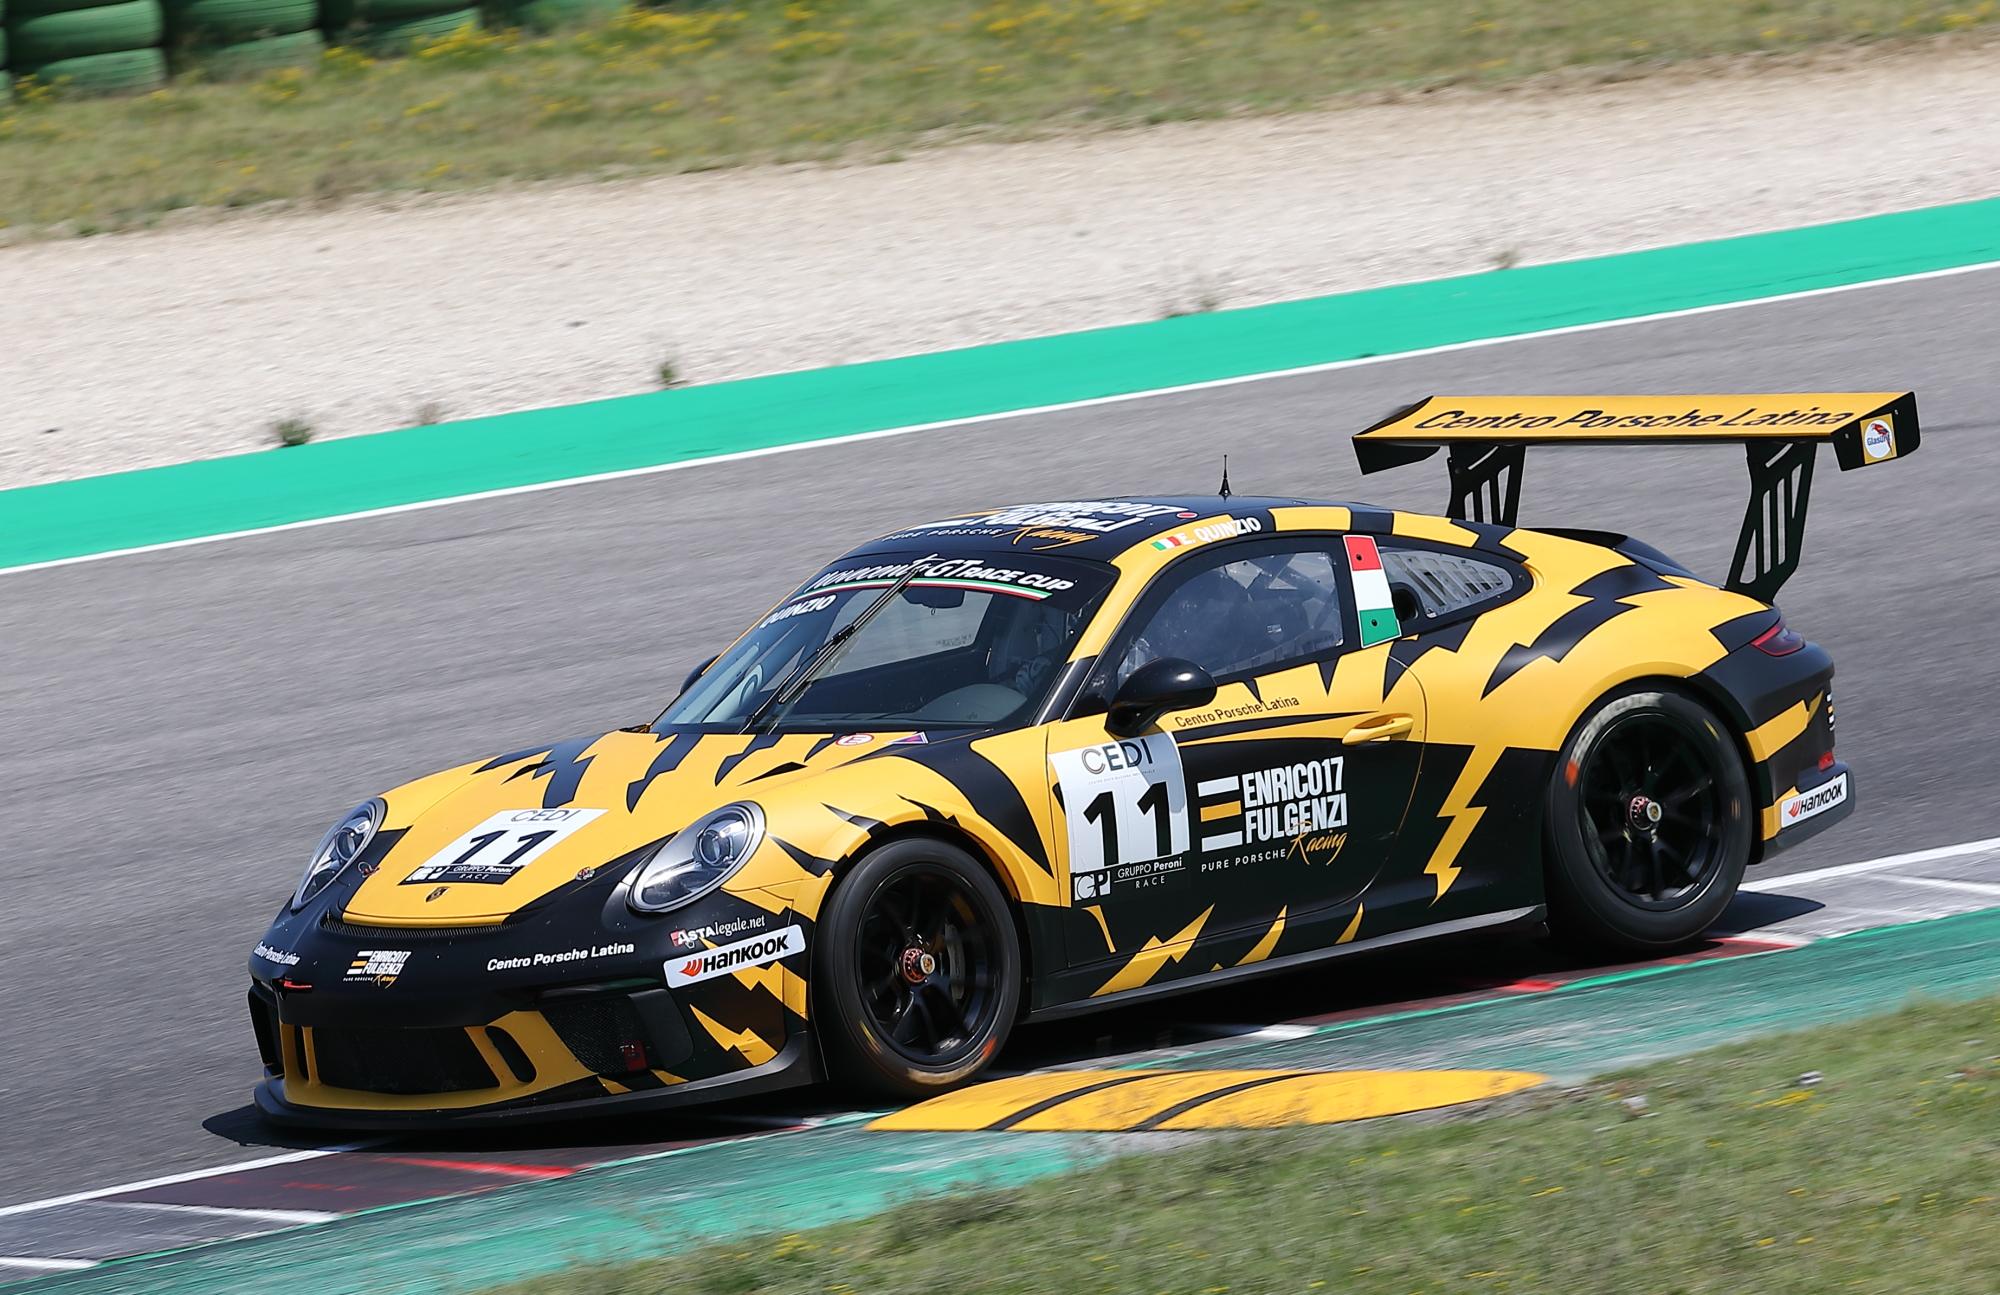 Misano - 12/07/2019 - Peroni Race...